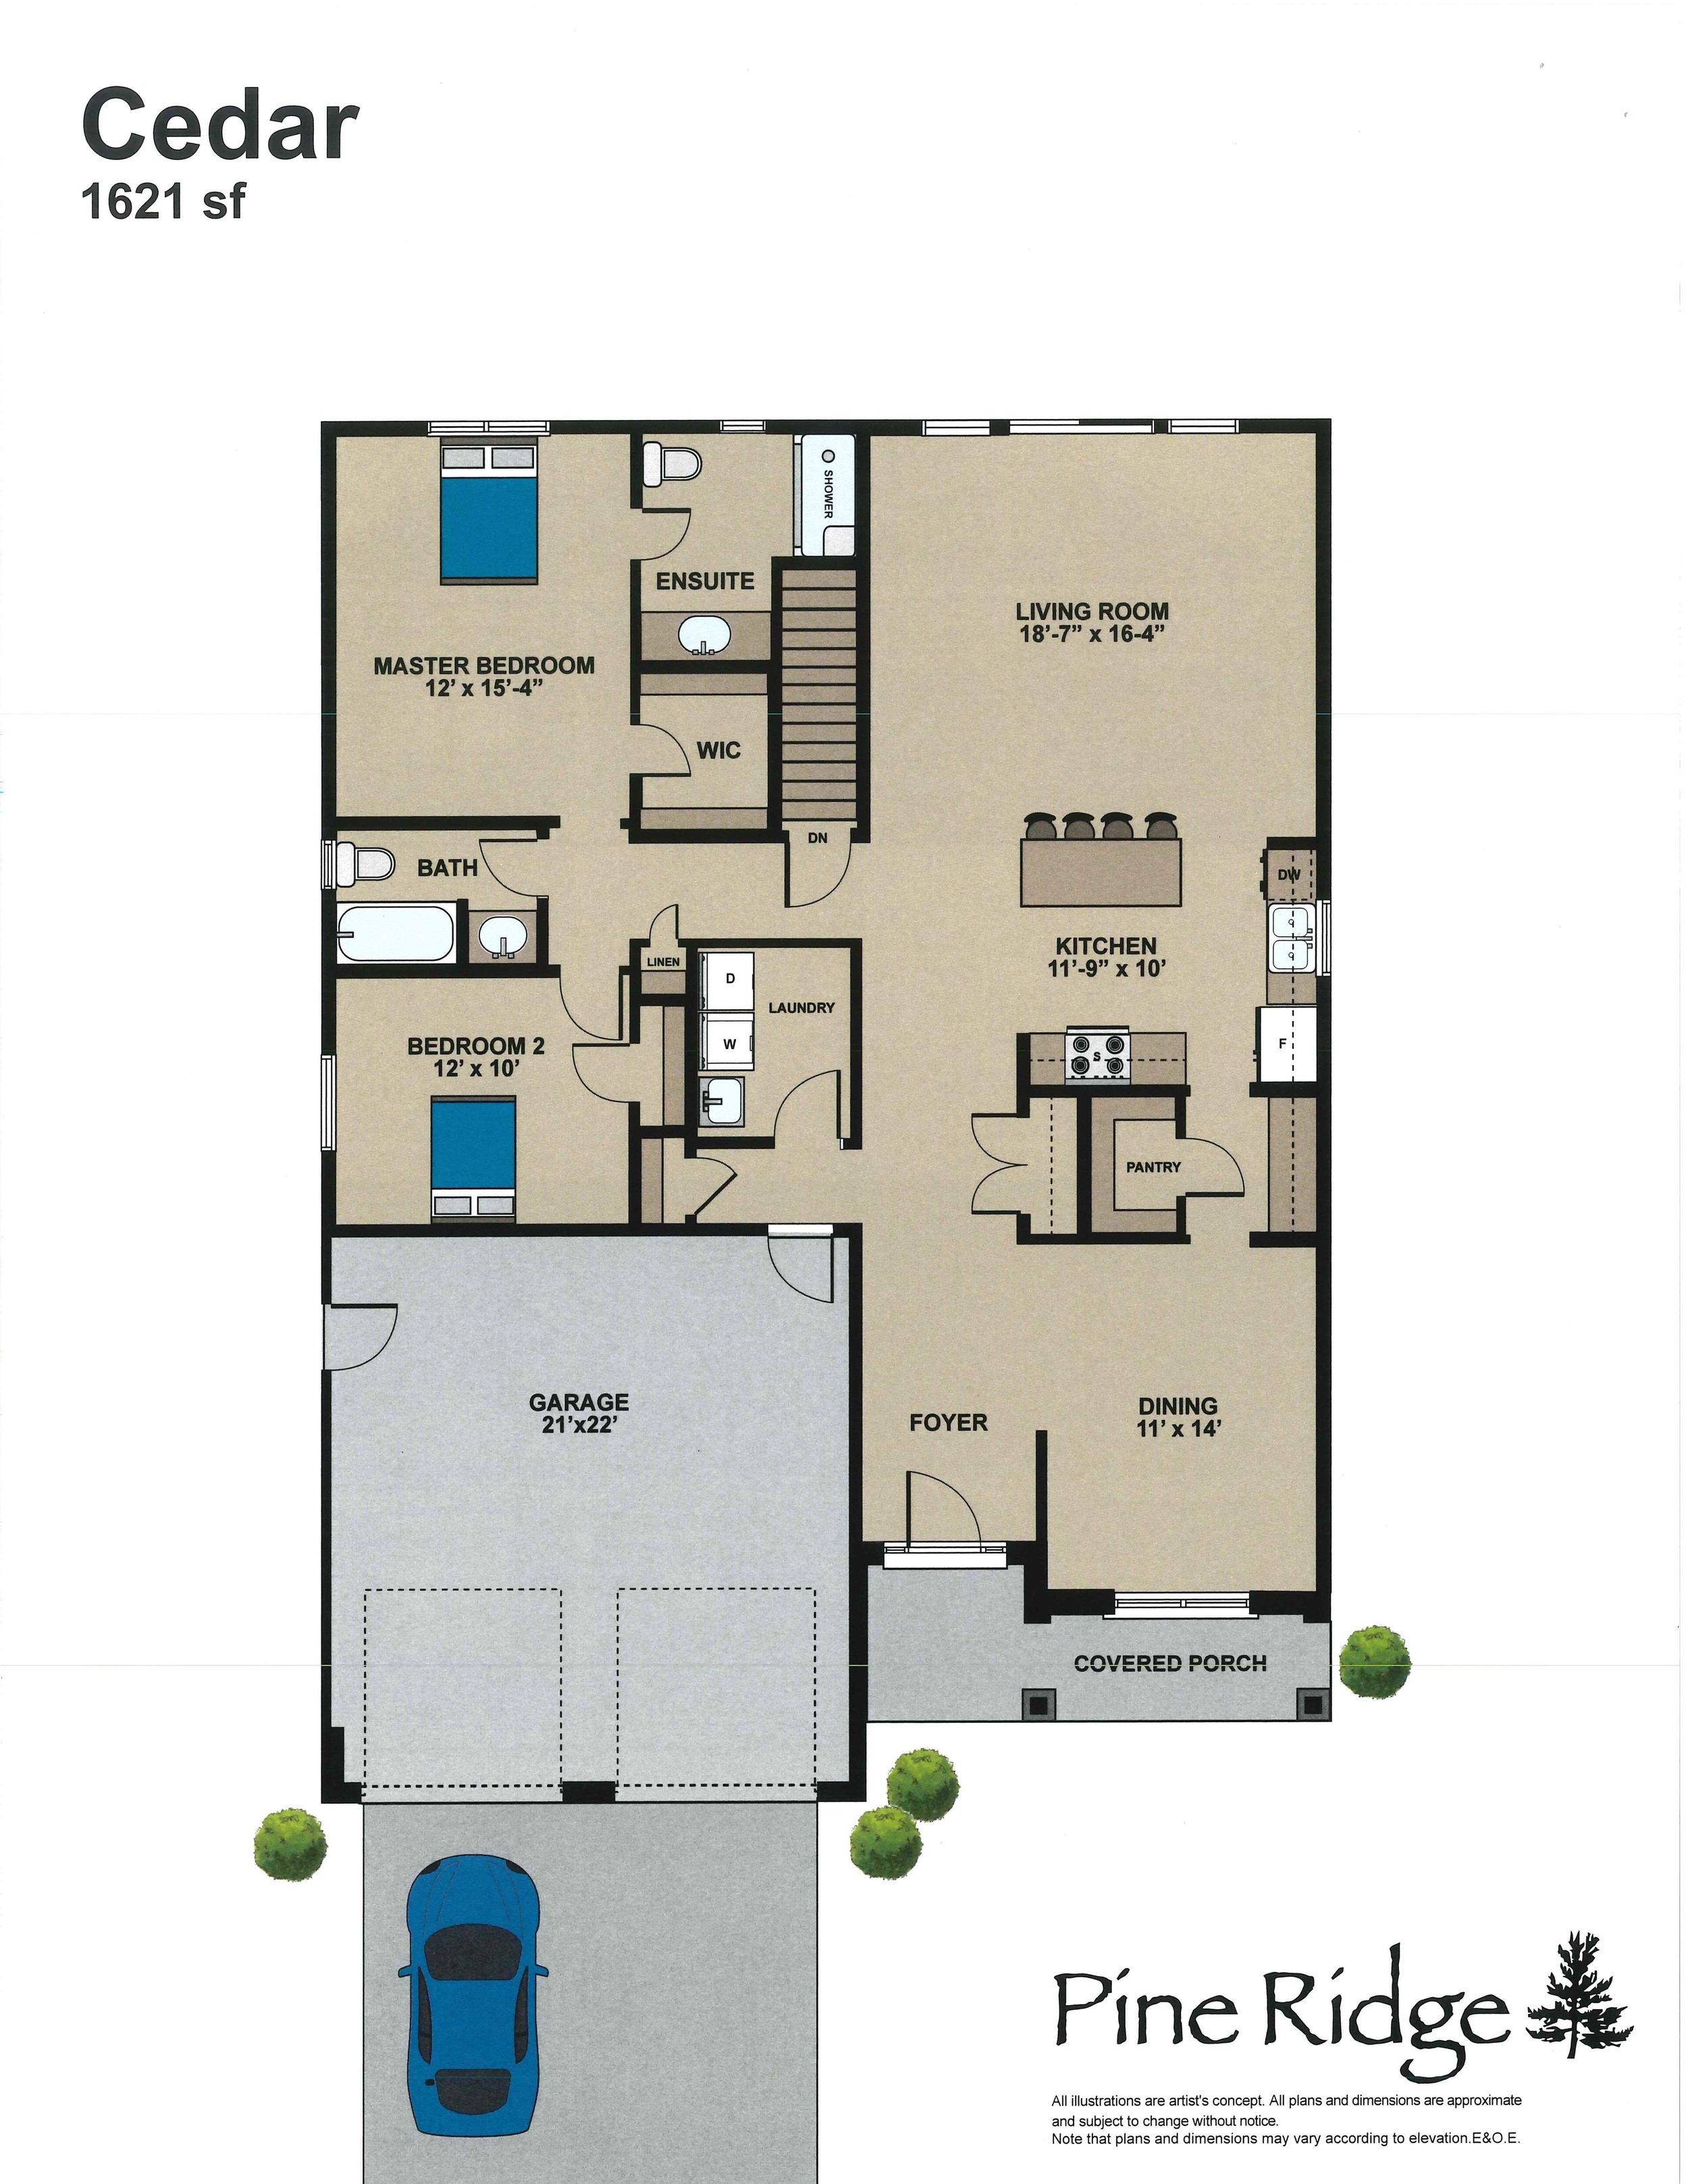 pineridge floorplans 1_Page_4.jpg